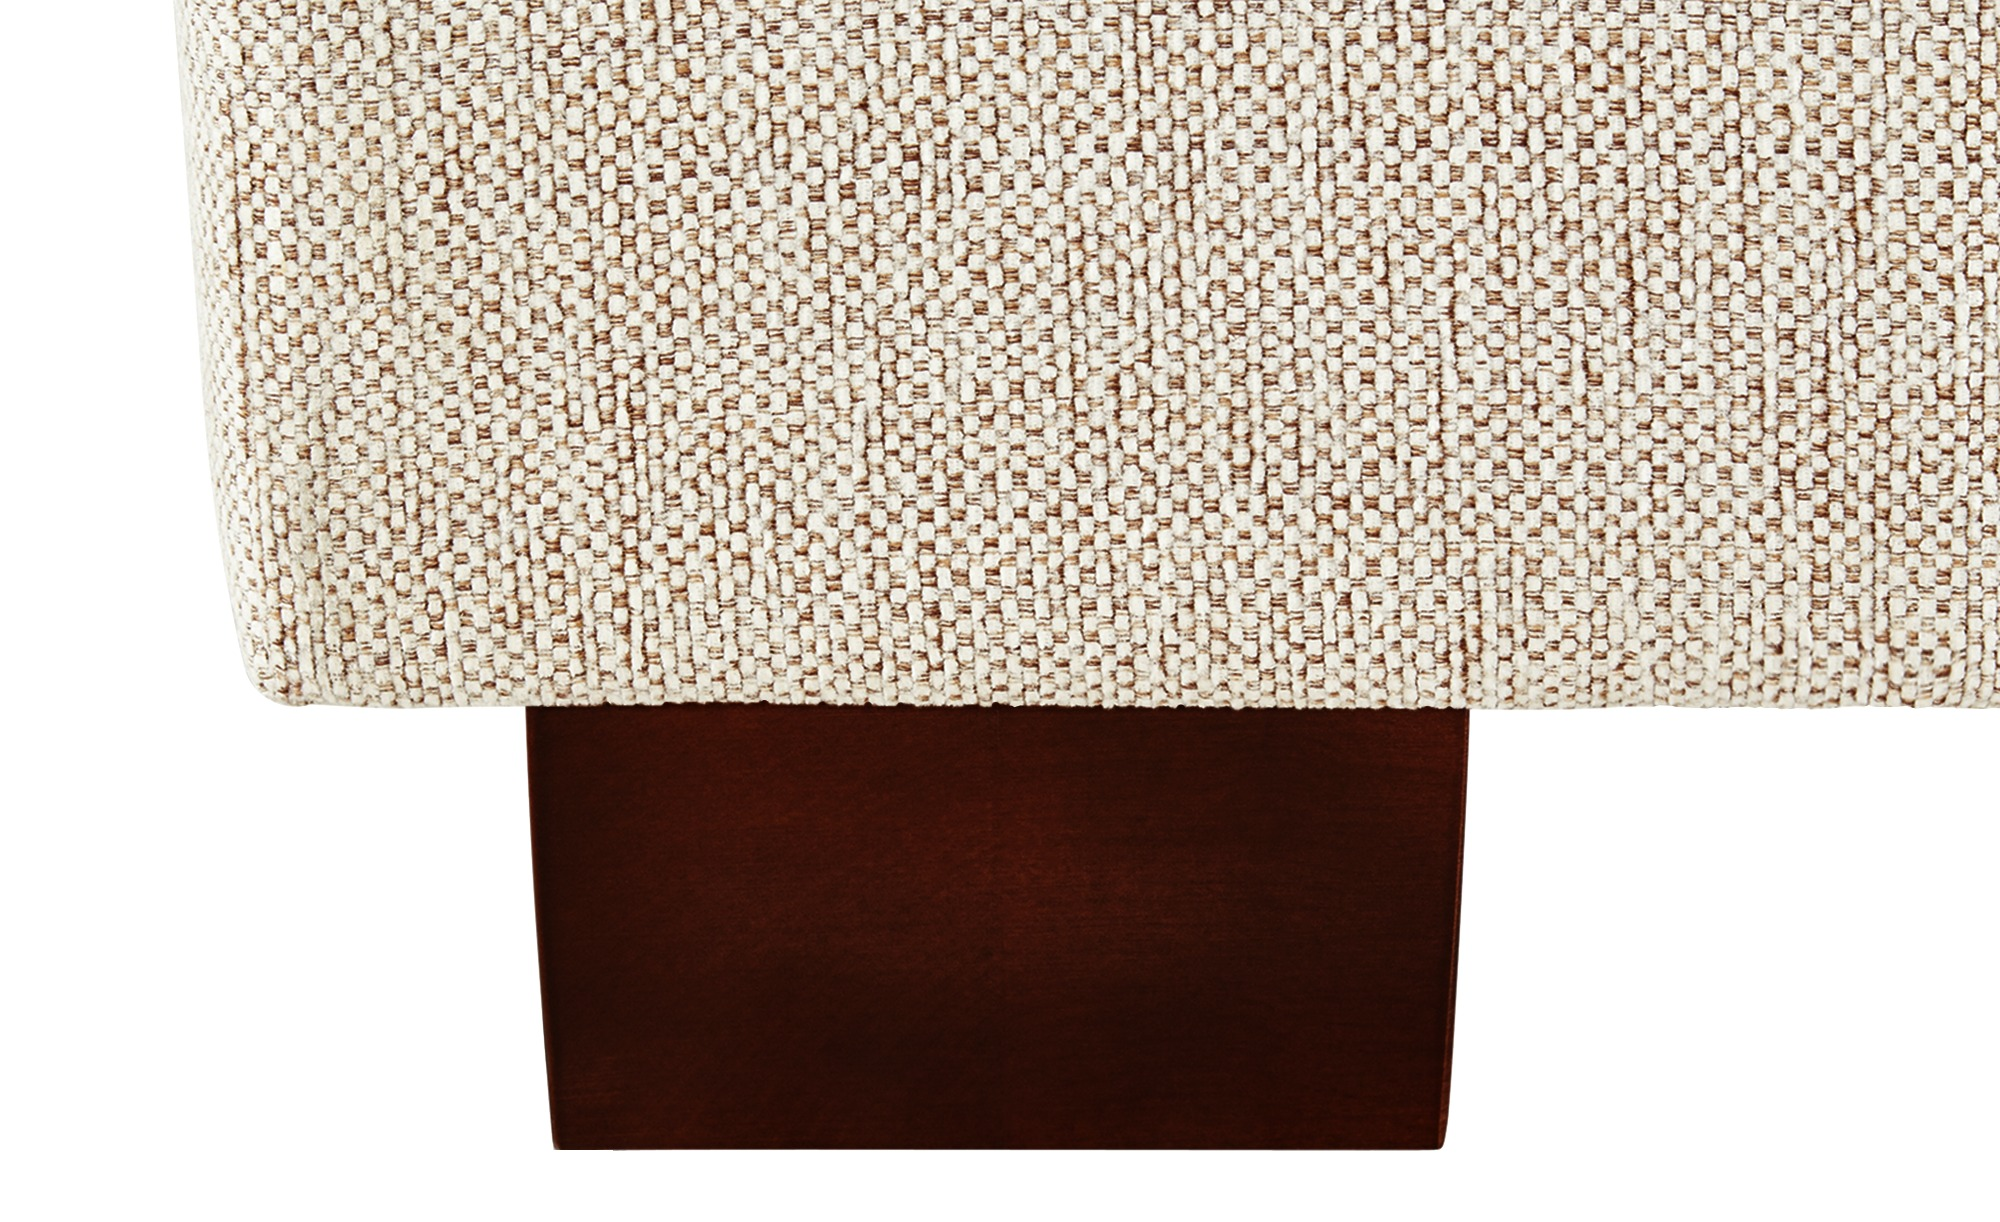 SOHO Sofa braun - Webstoff Franka ¦ Maße (cm): B: 136 H: 87 T: 103 Polstermöbel > Sofas > Einzelsofas - Höffner